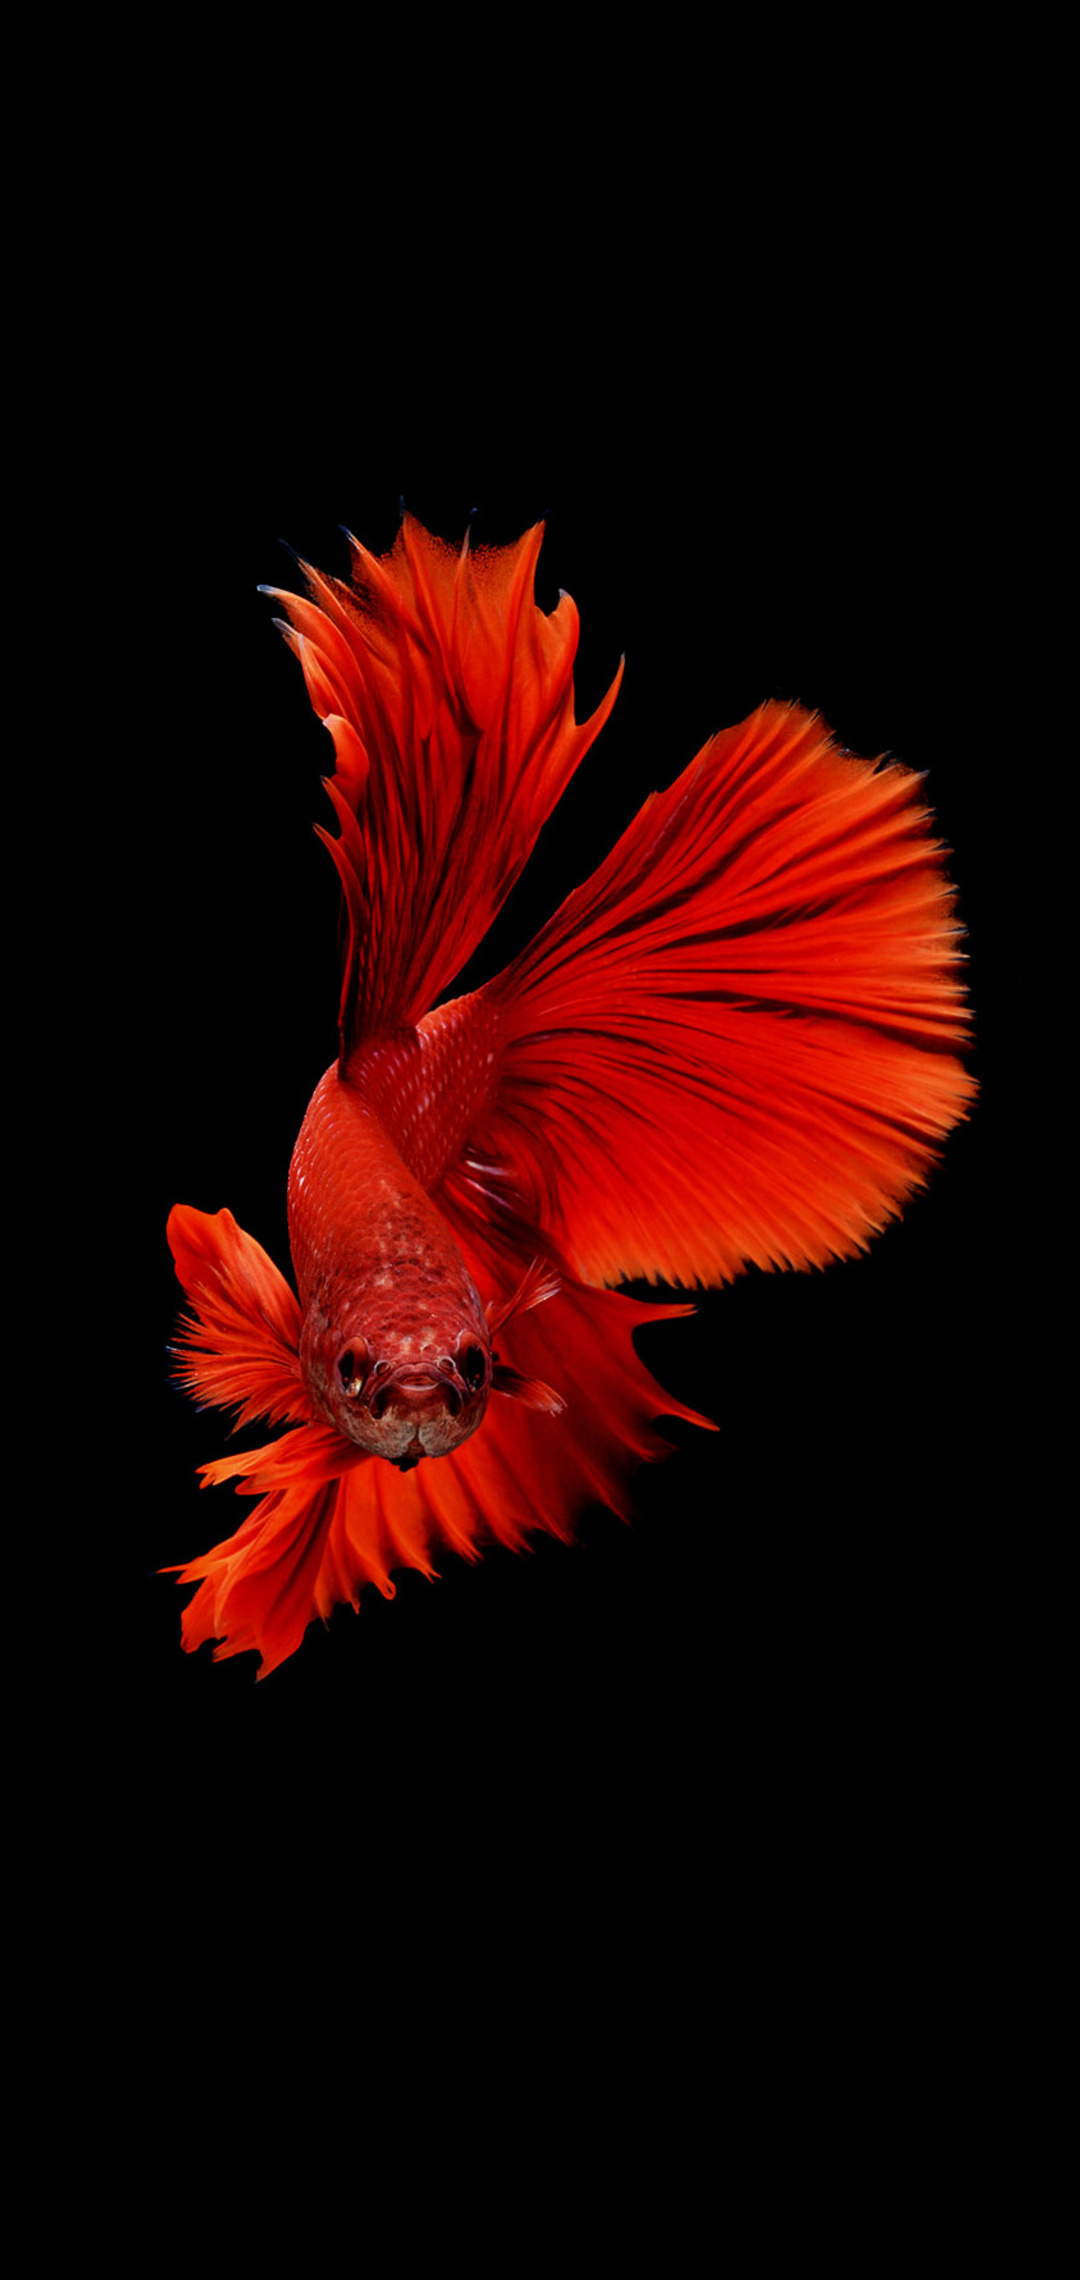 betta-fish-rc.jpg